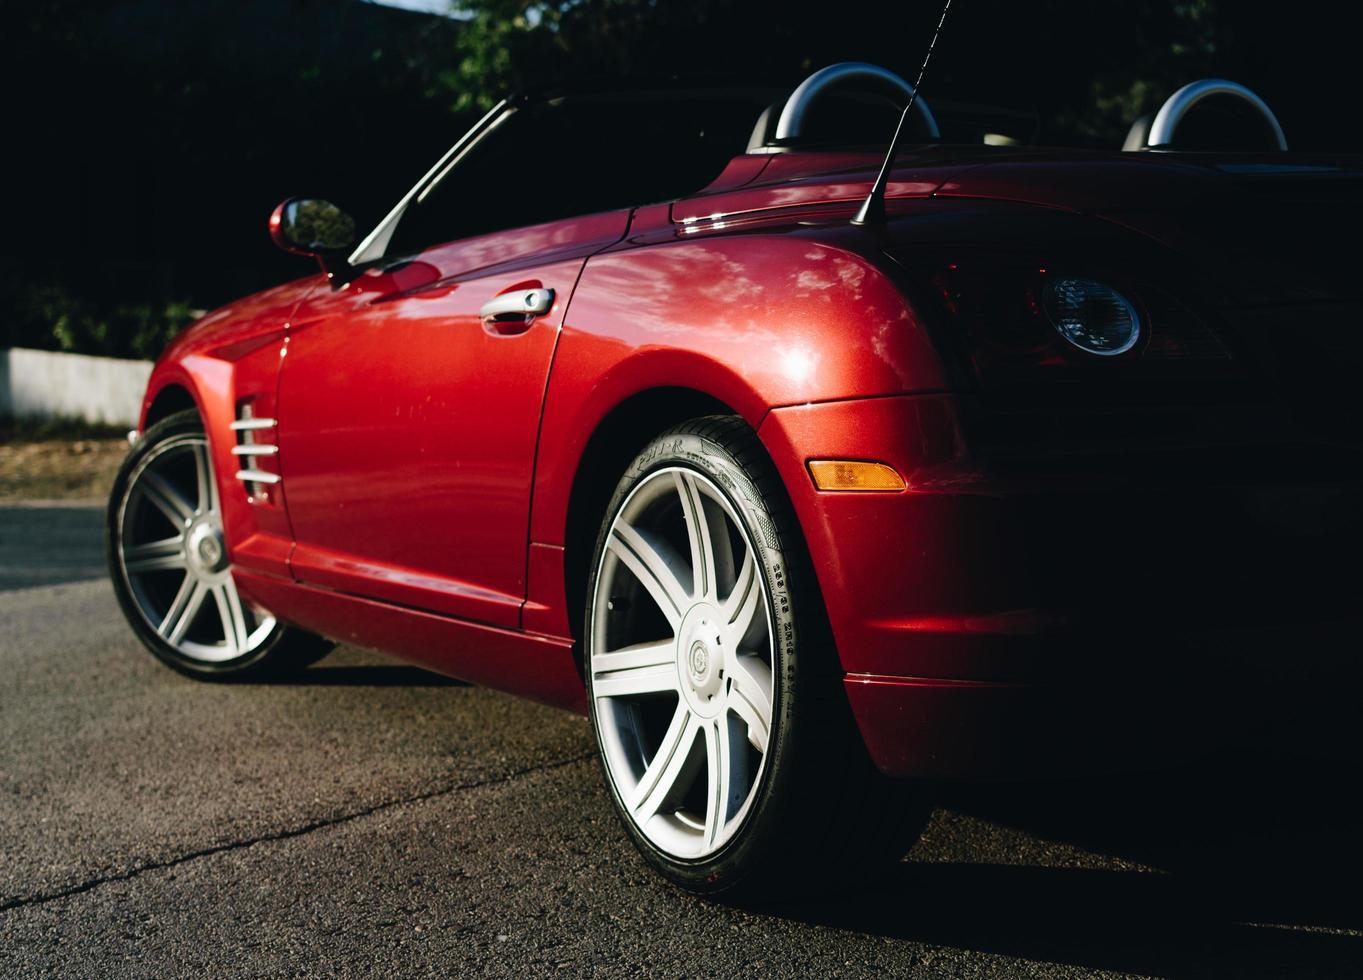 Chrysler Crossfire en la carretera foto